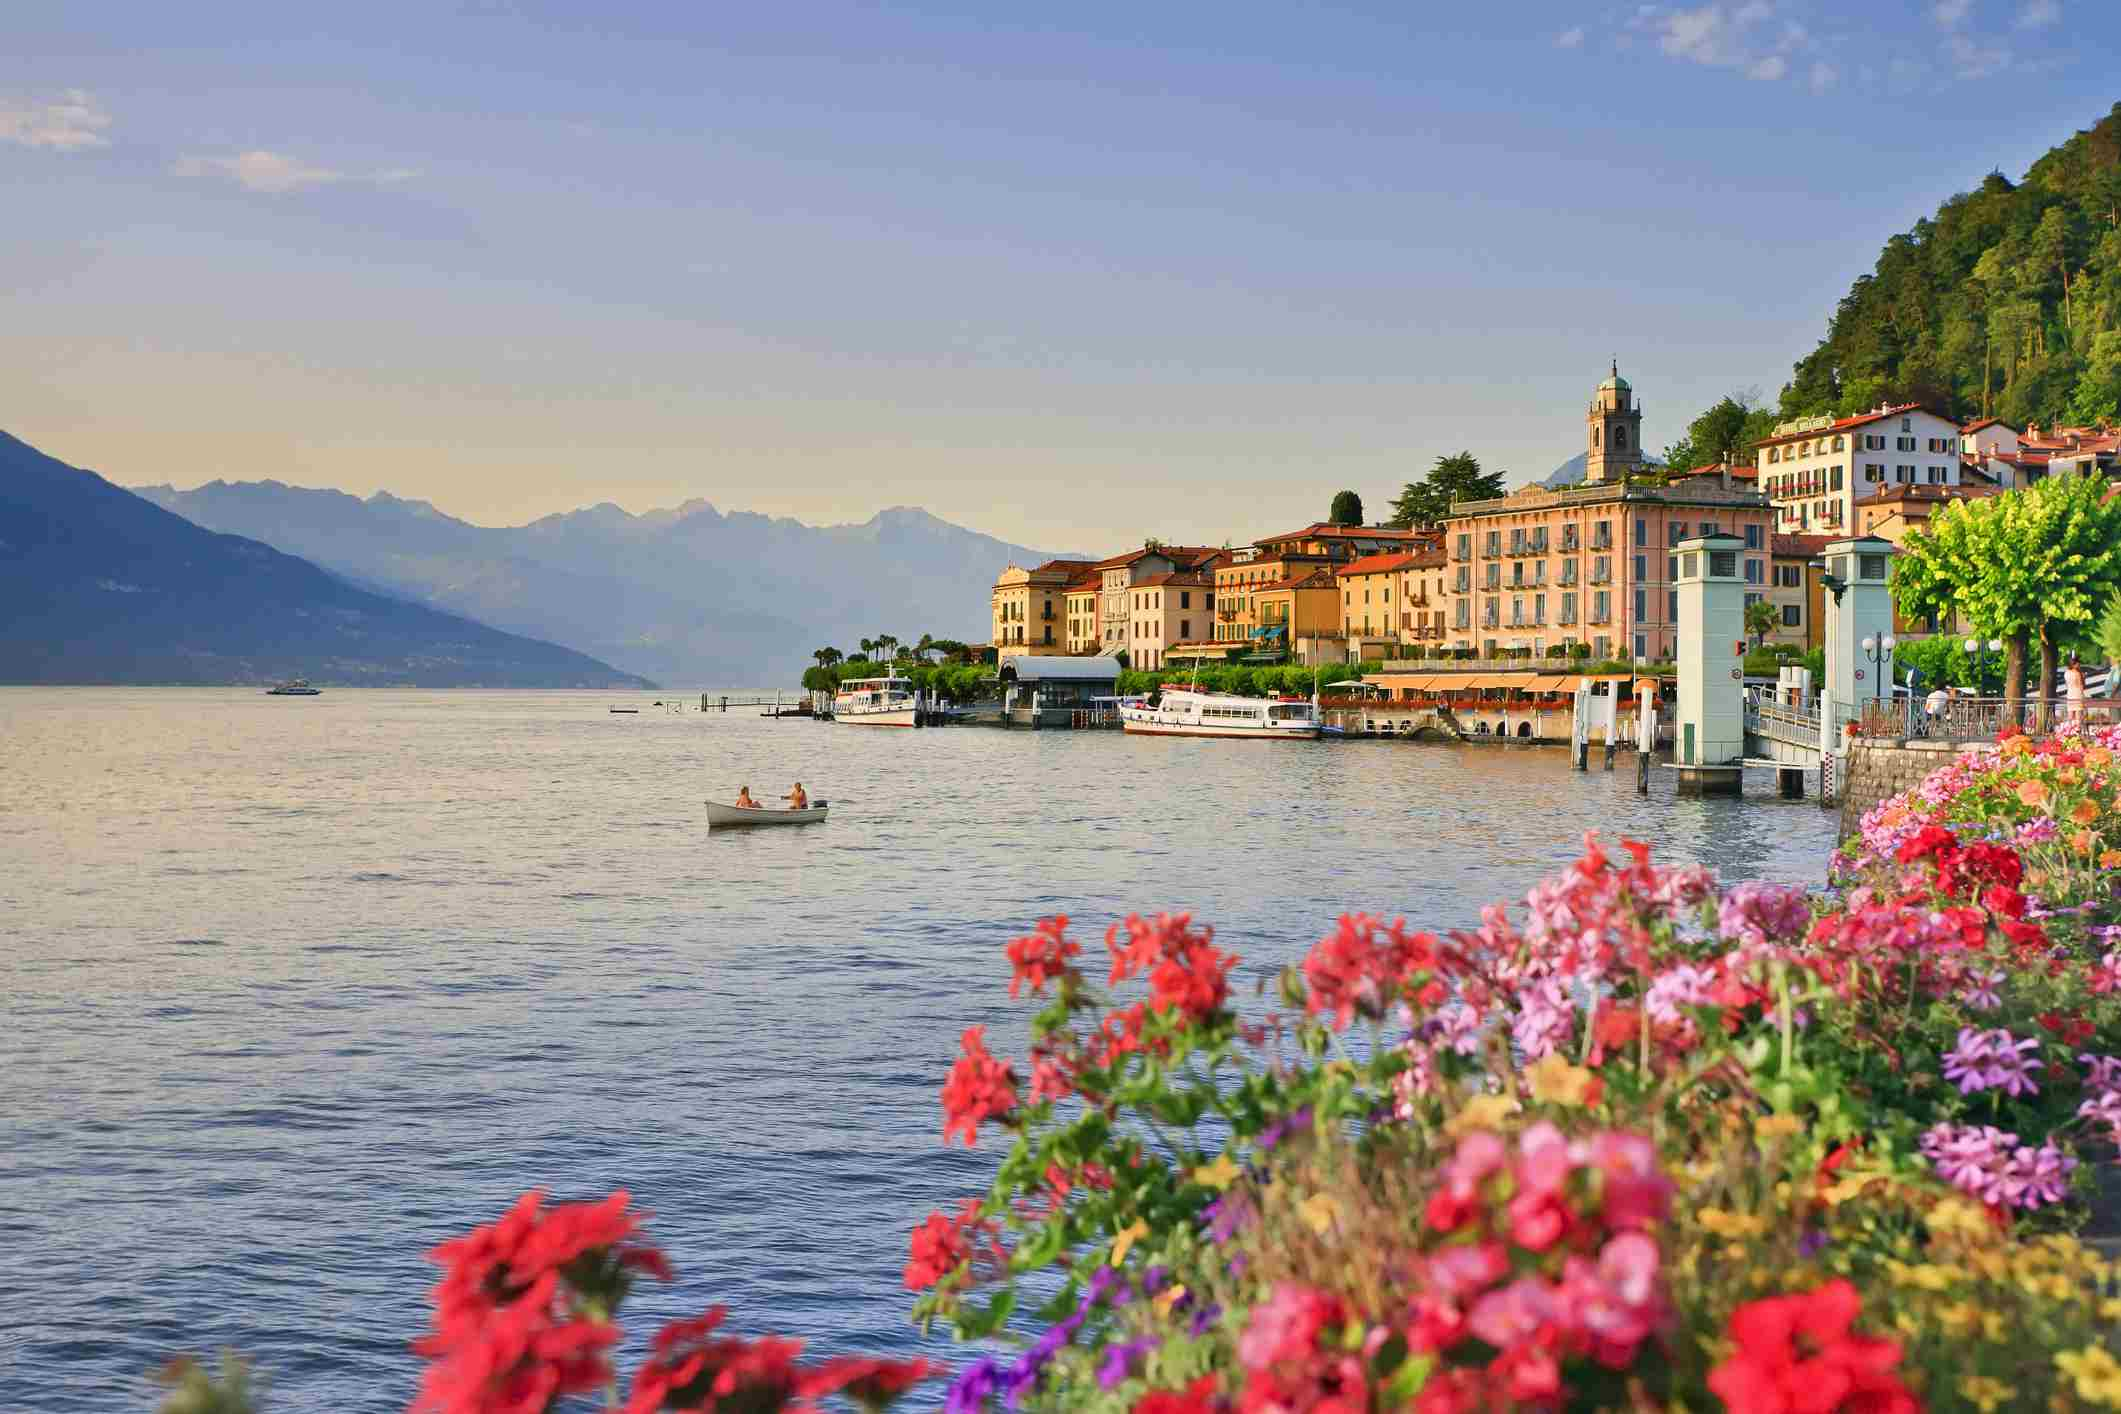 Italy, Lombardy, Como district. Como Lake, View of Bellagio